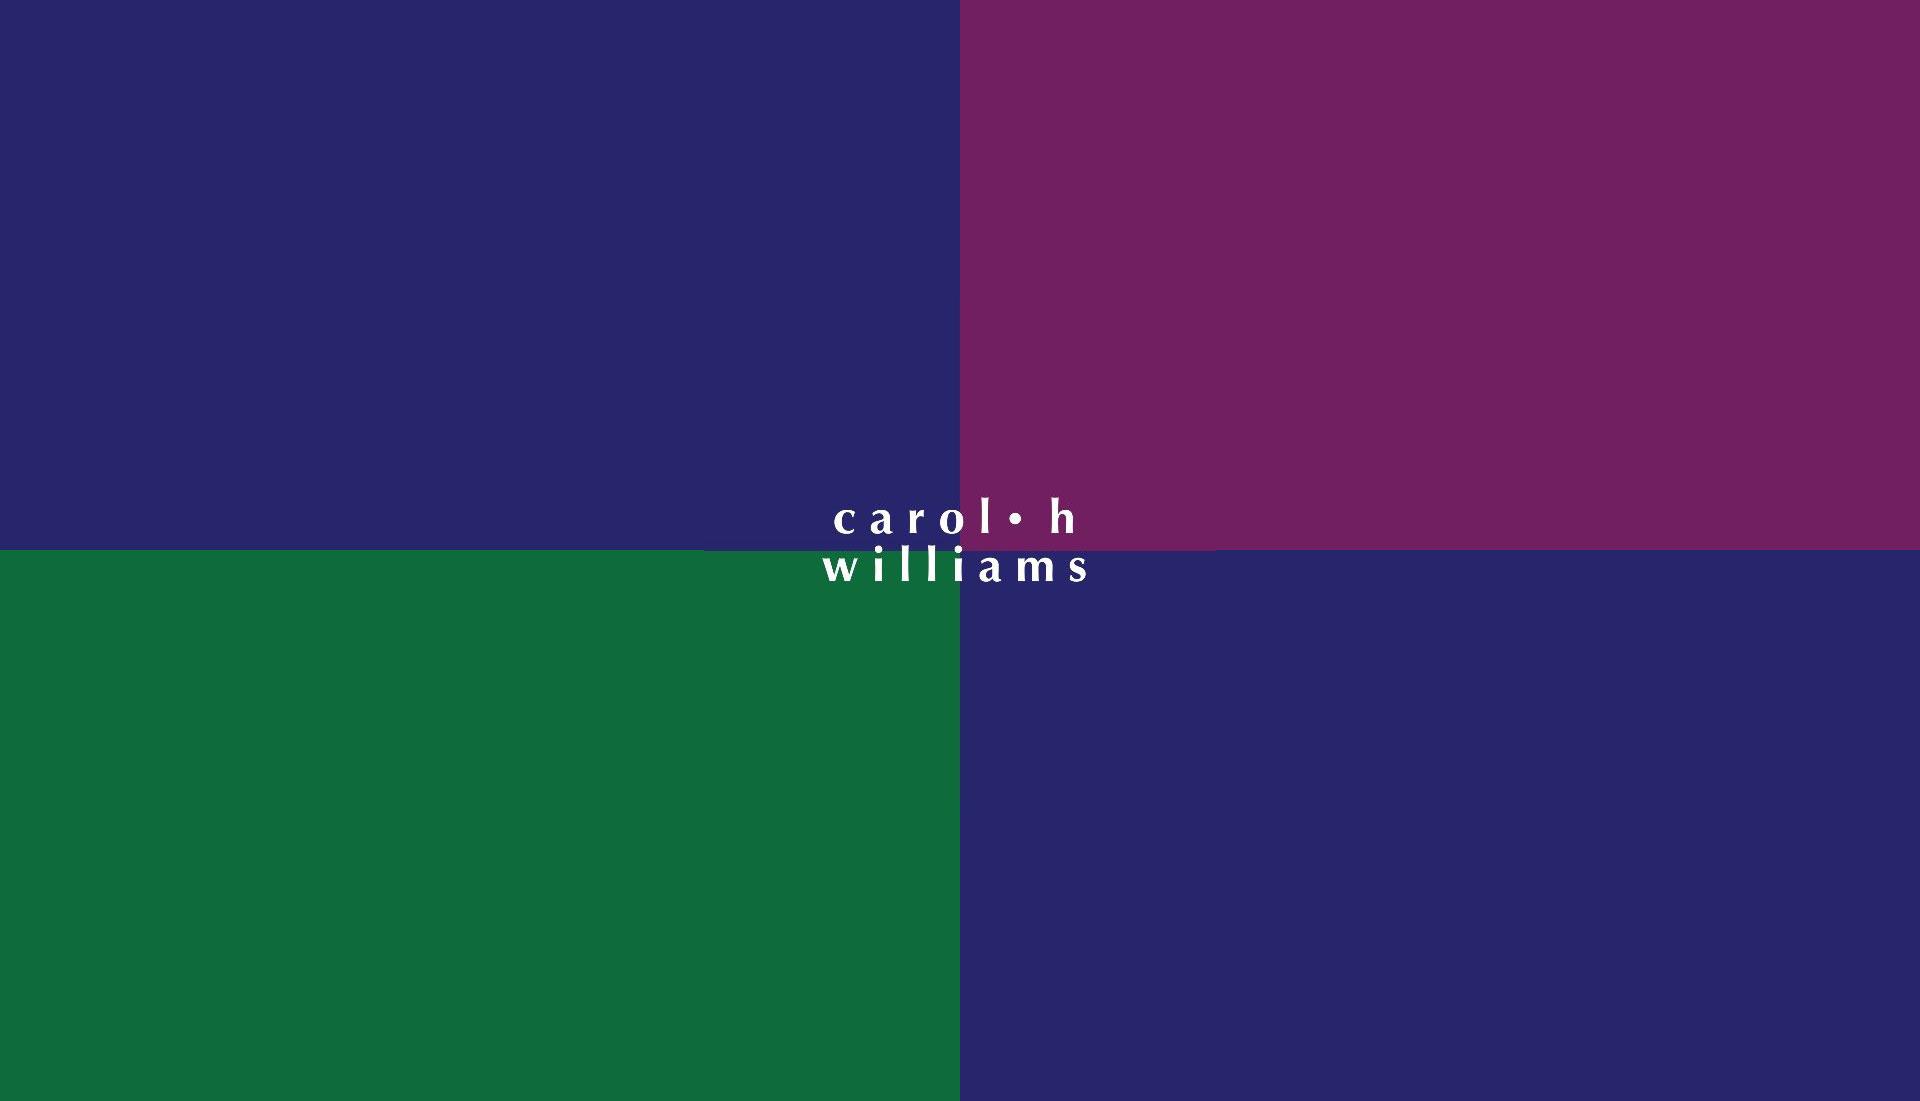 carol-h-williams.jpg